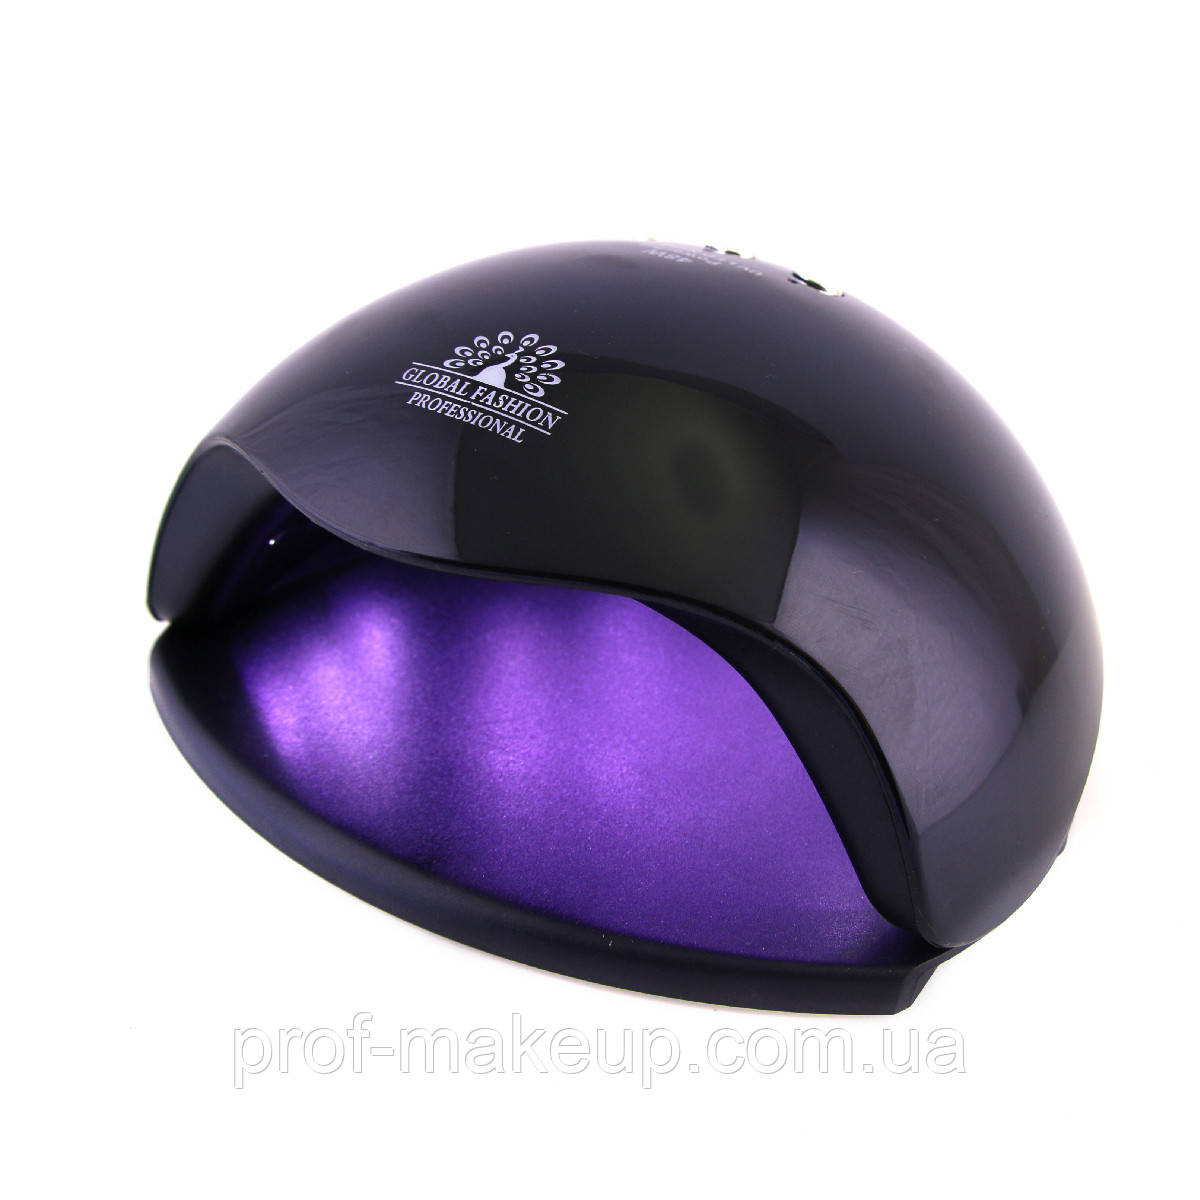 "Лампа для сушки ногтей  ""Global Fashion""  SUN-5 черная"